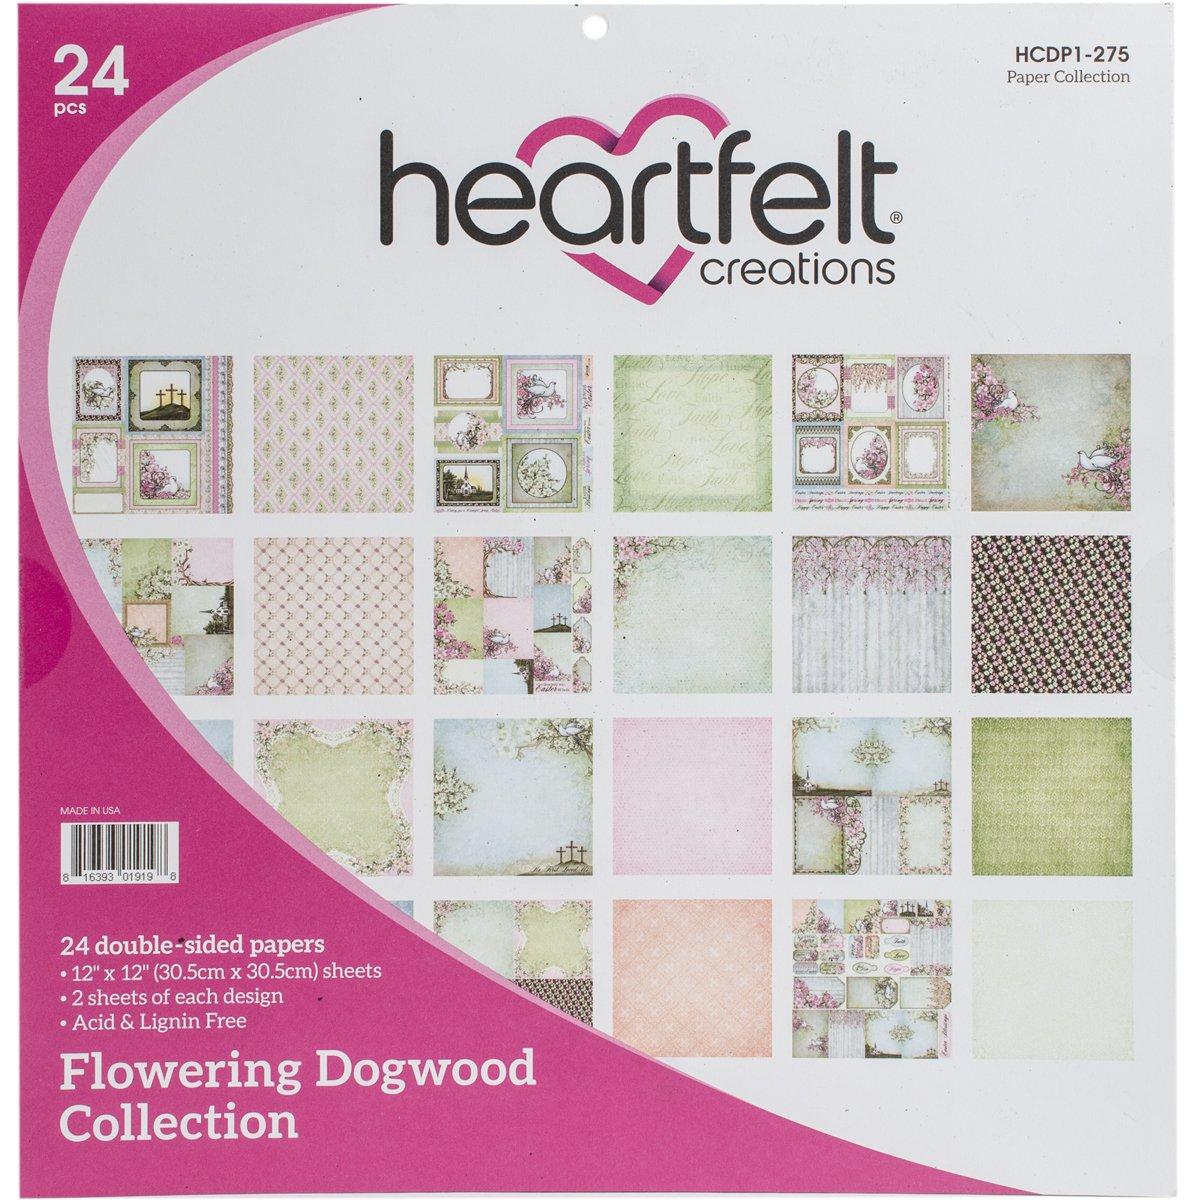 Heartfelt Creations Doppelseitiges Papier Pad 31,75/x 30,48/x 0,76/cm Mehrfarbig